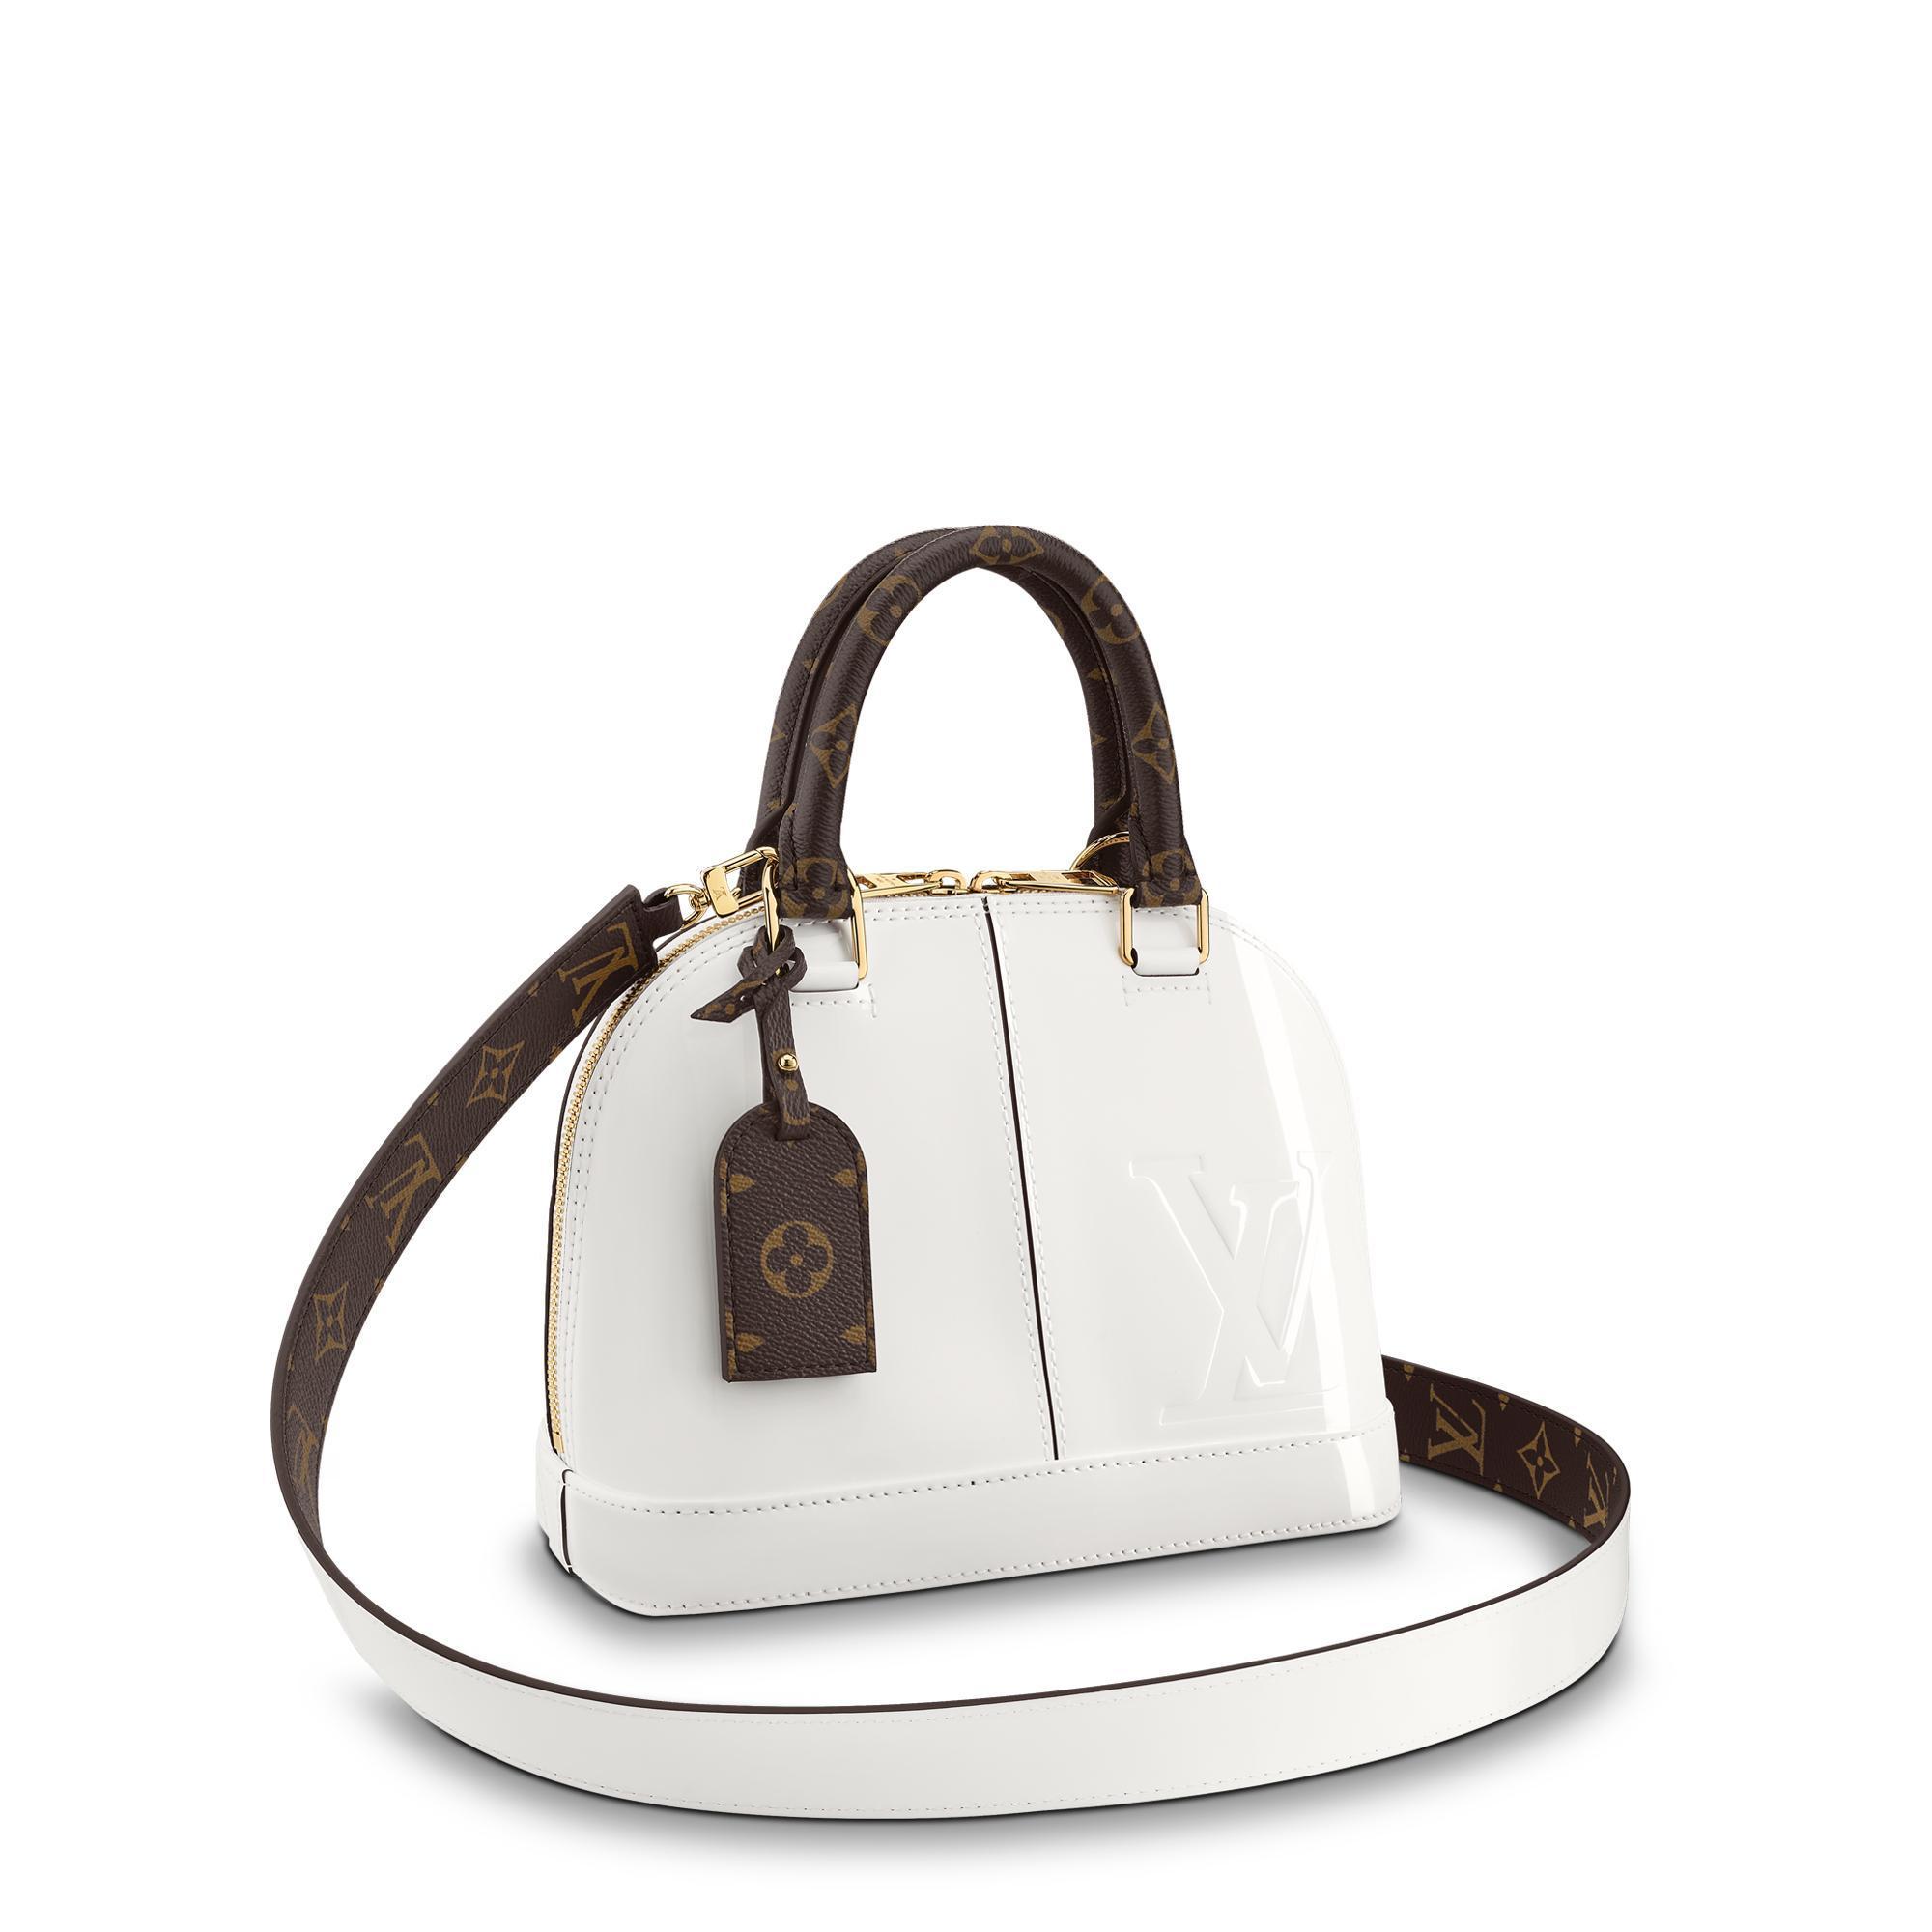 b005f386c892 Louis Vuitton Alma Bb In Blanc